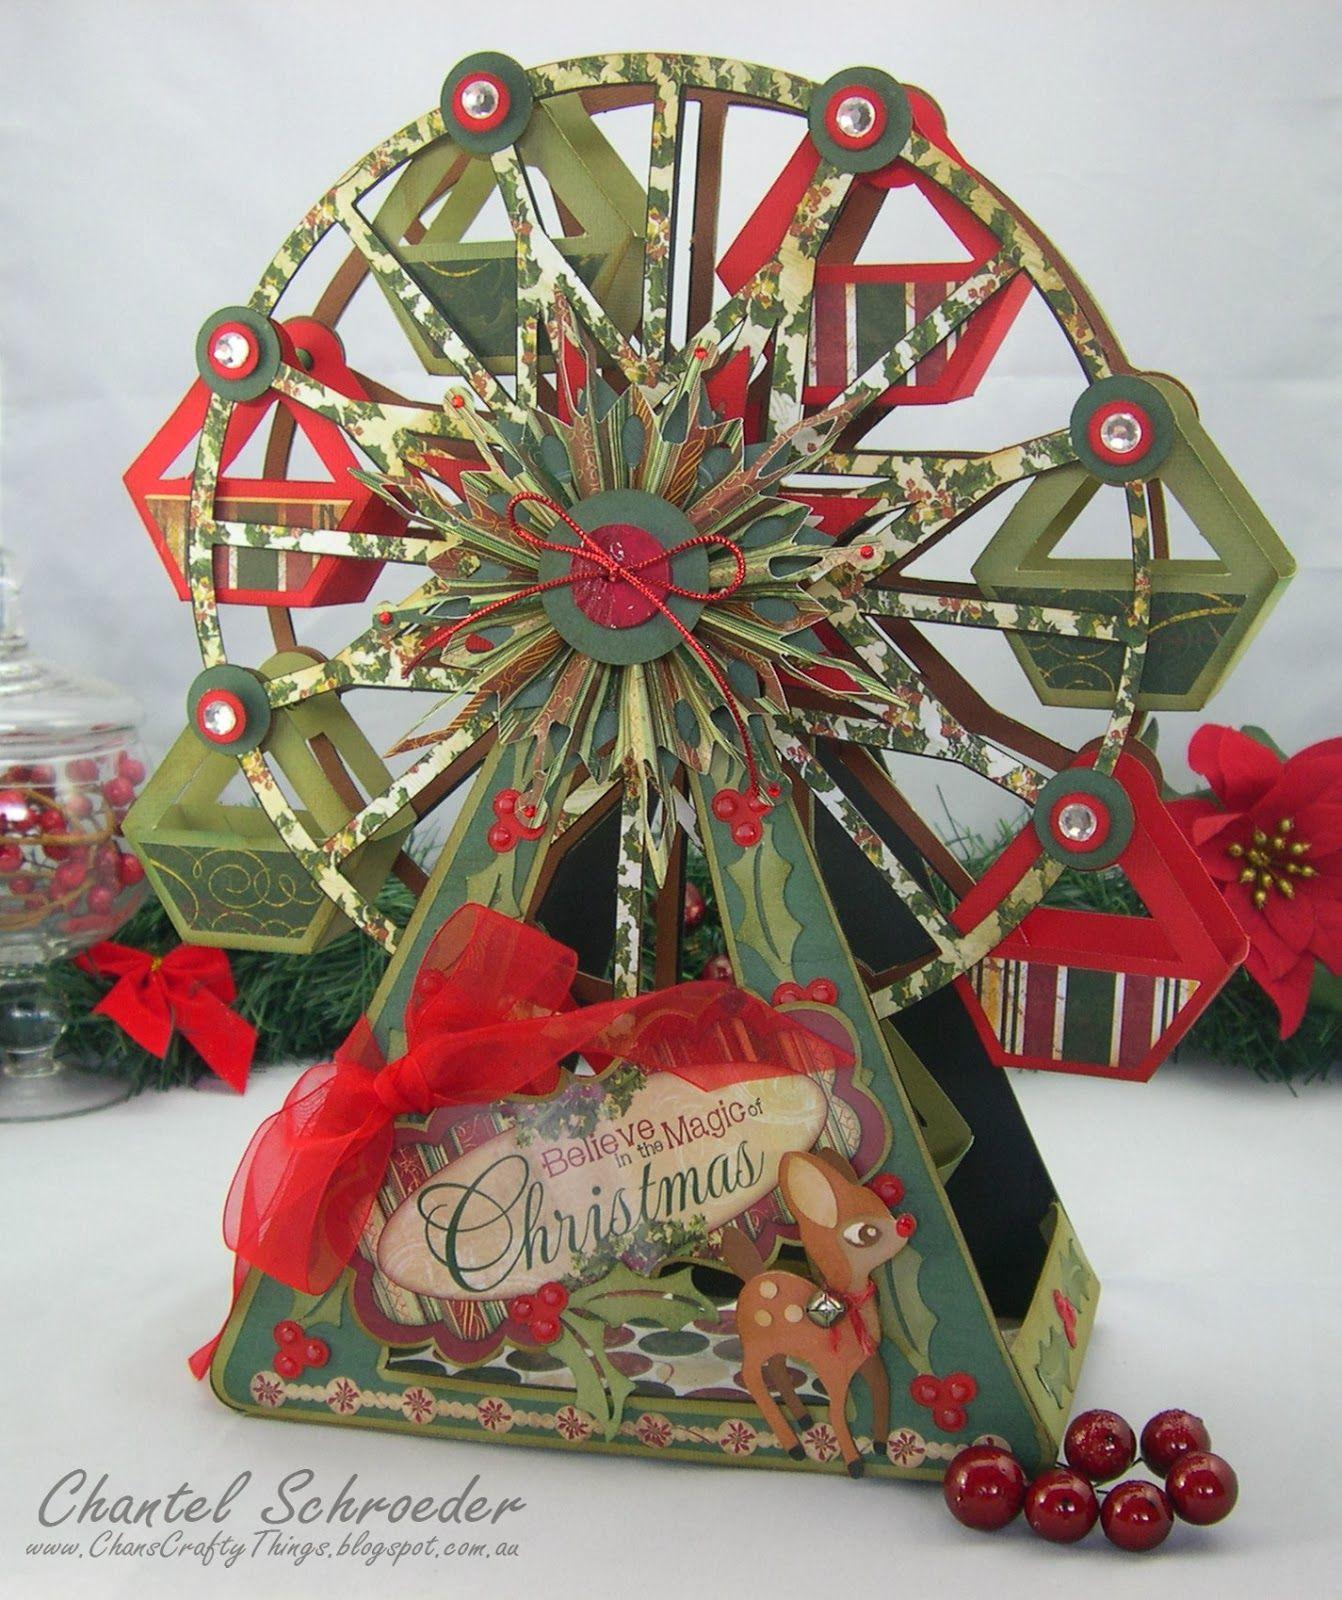 Chans Crafty Things Christmas Ferris Wheel